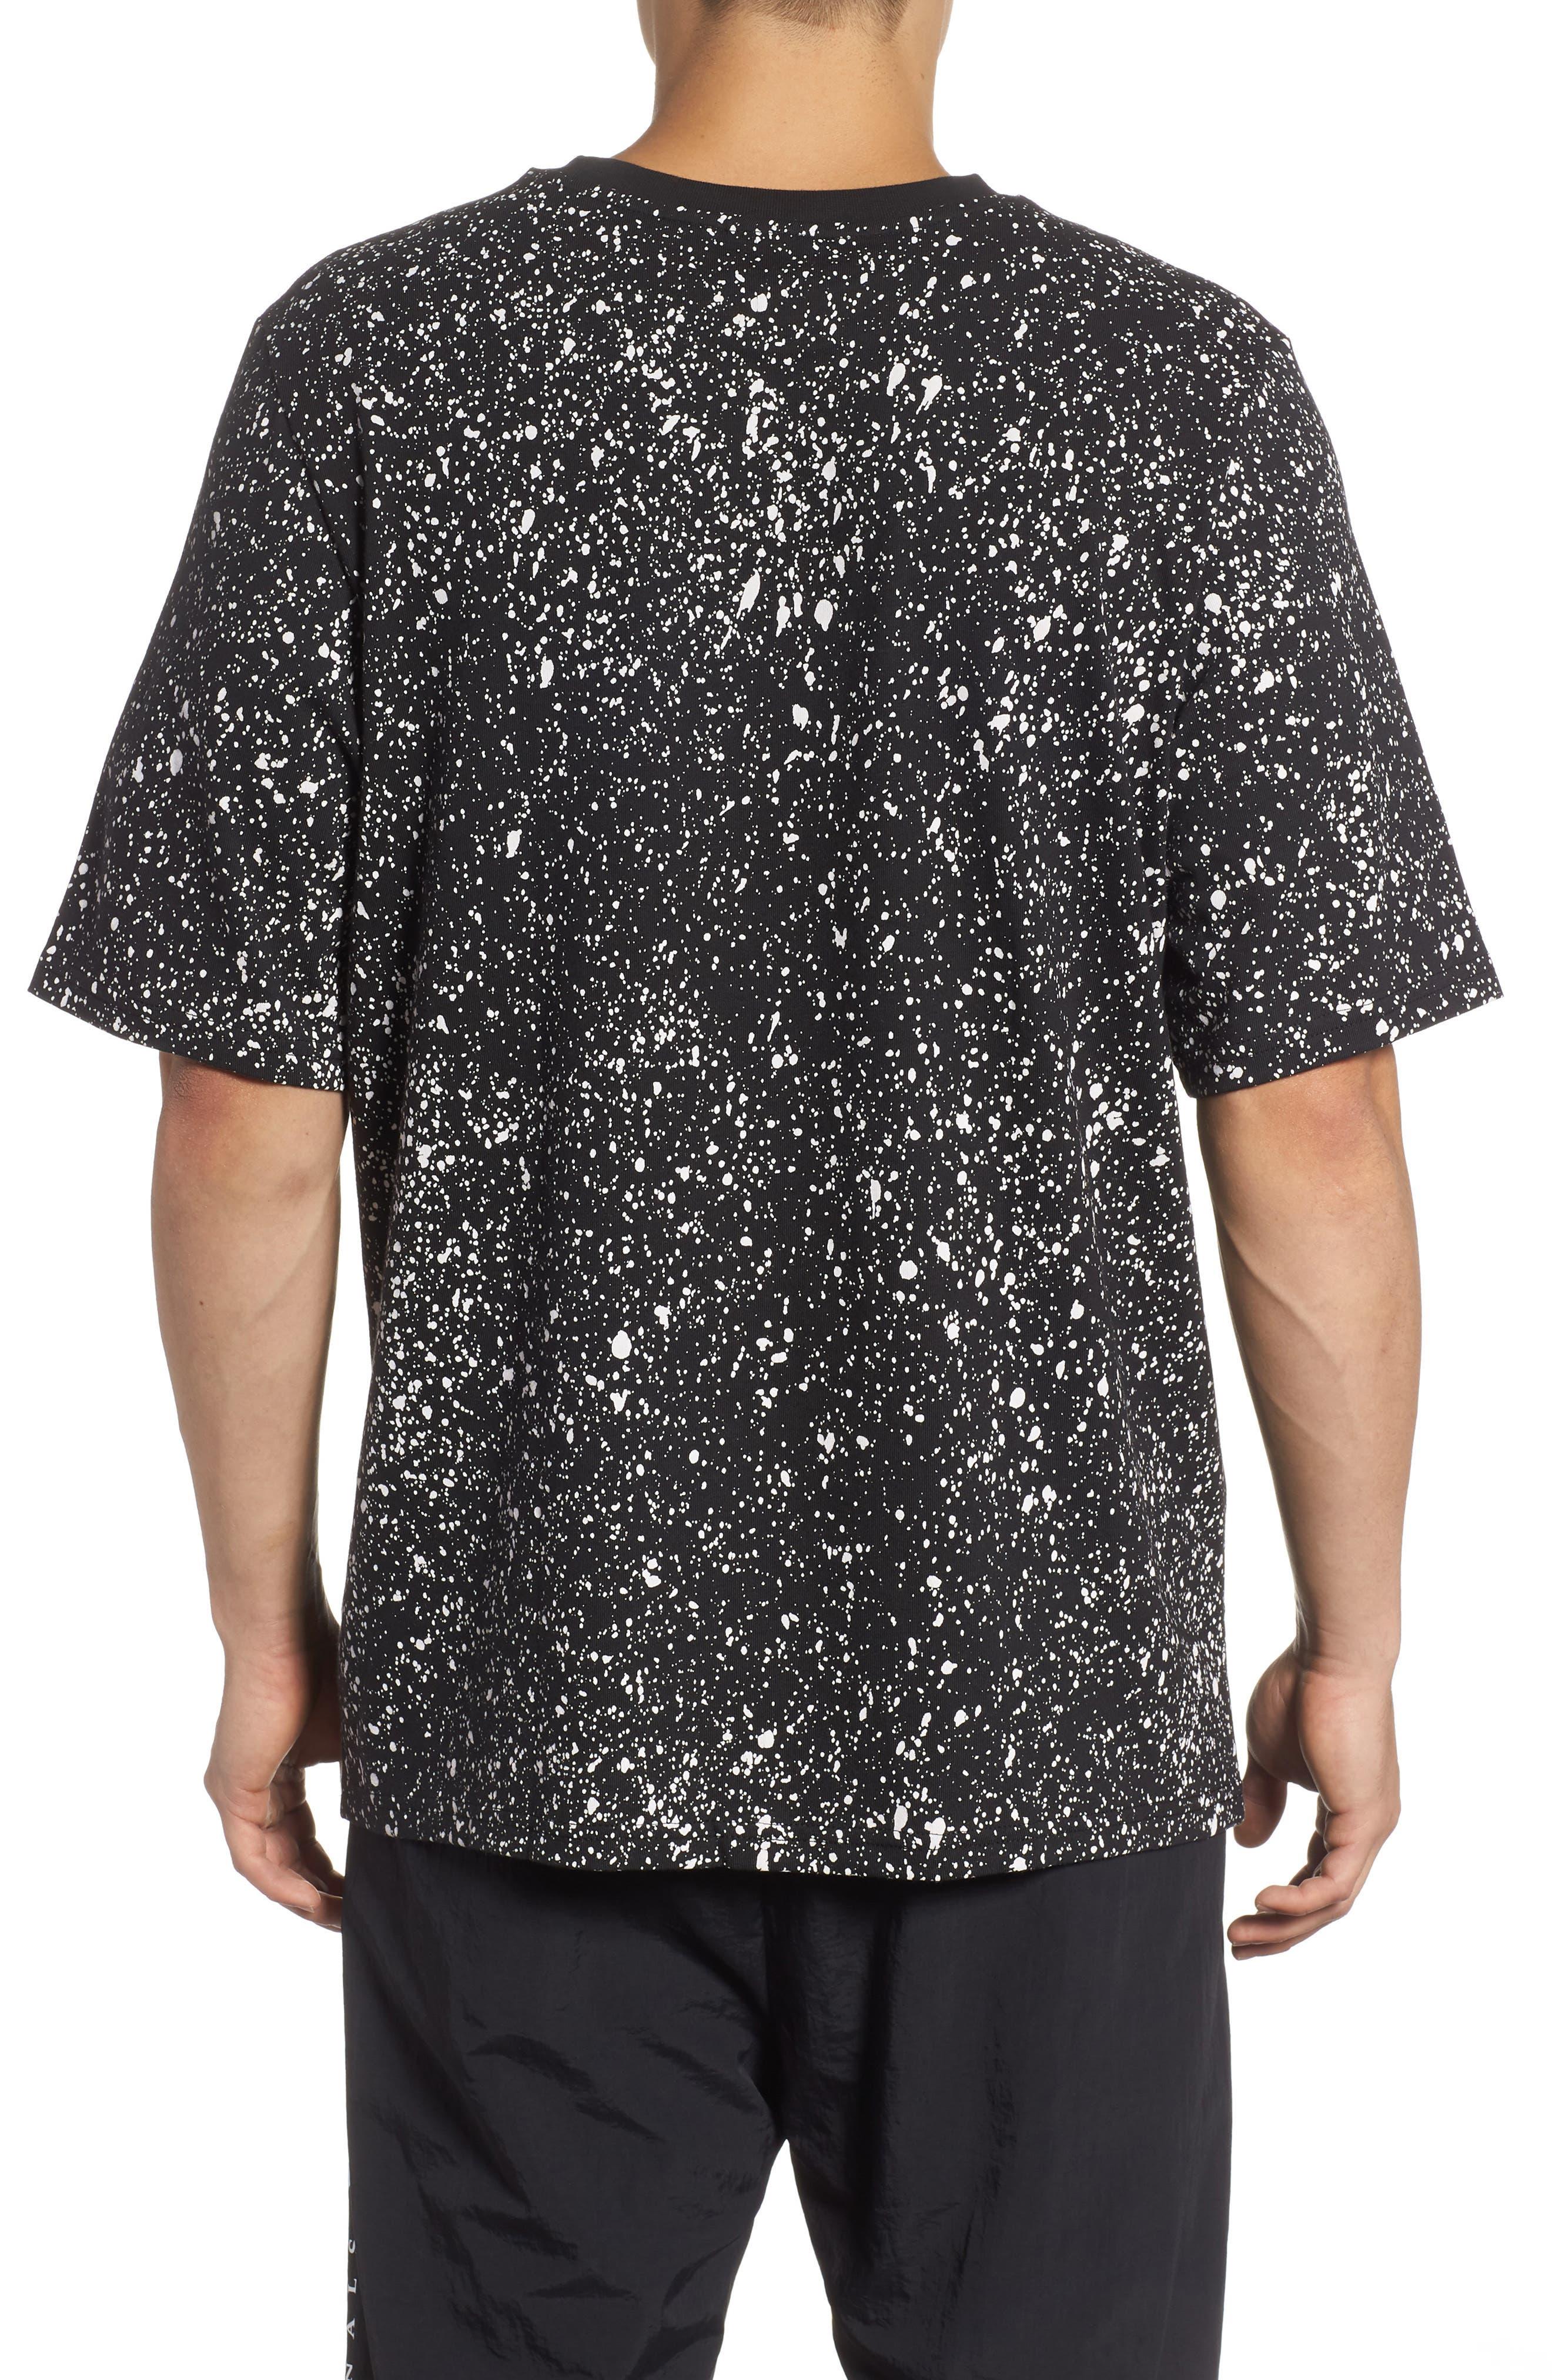 Planetoid Allover Print T-Shirt,                             Alternate thumbnail 2, color,                             BLACK